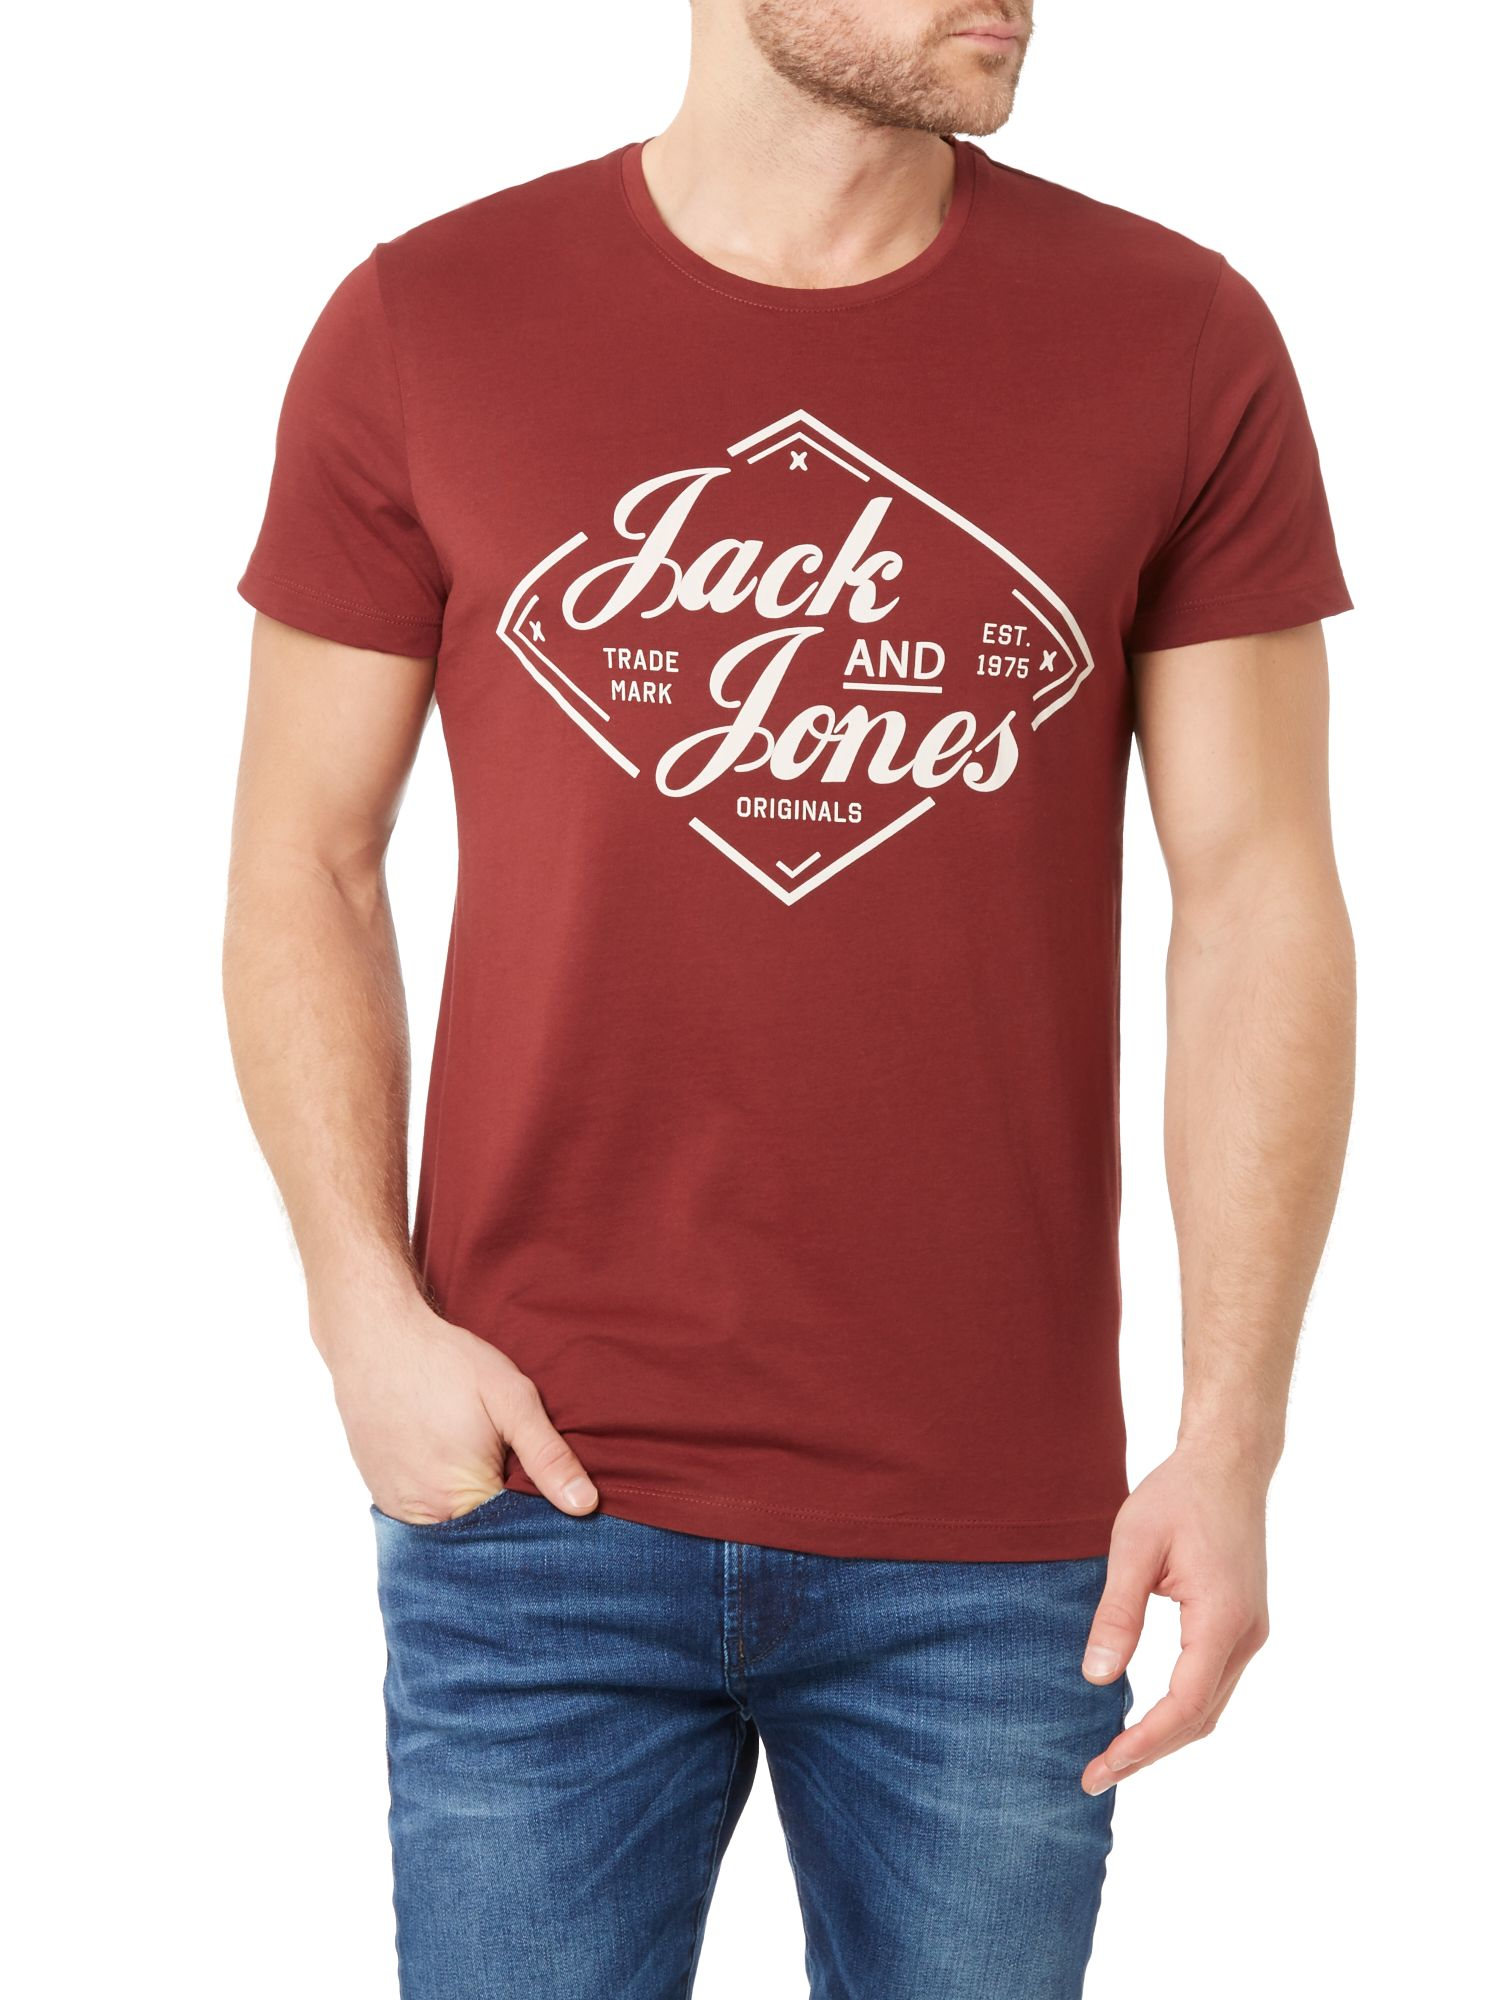 jack jones diamond crew neck short sleeve t shirt in red. Black Bedroom Furniture Sets. Home Design Ideas